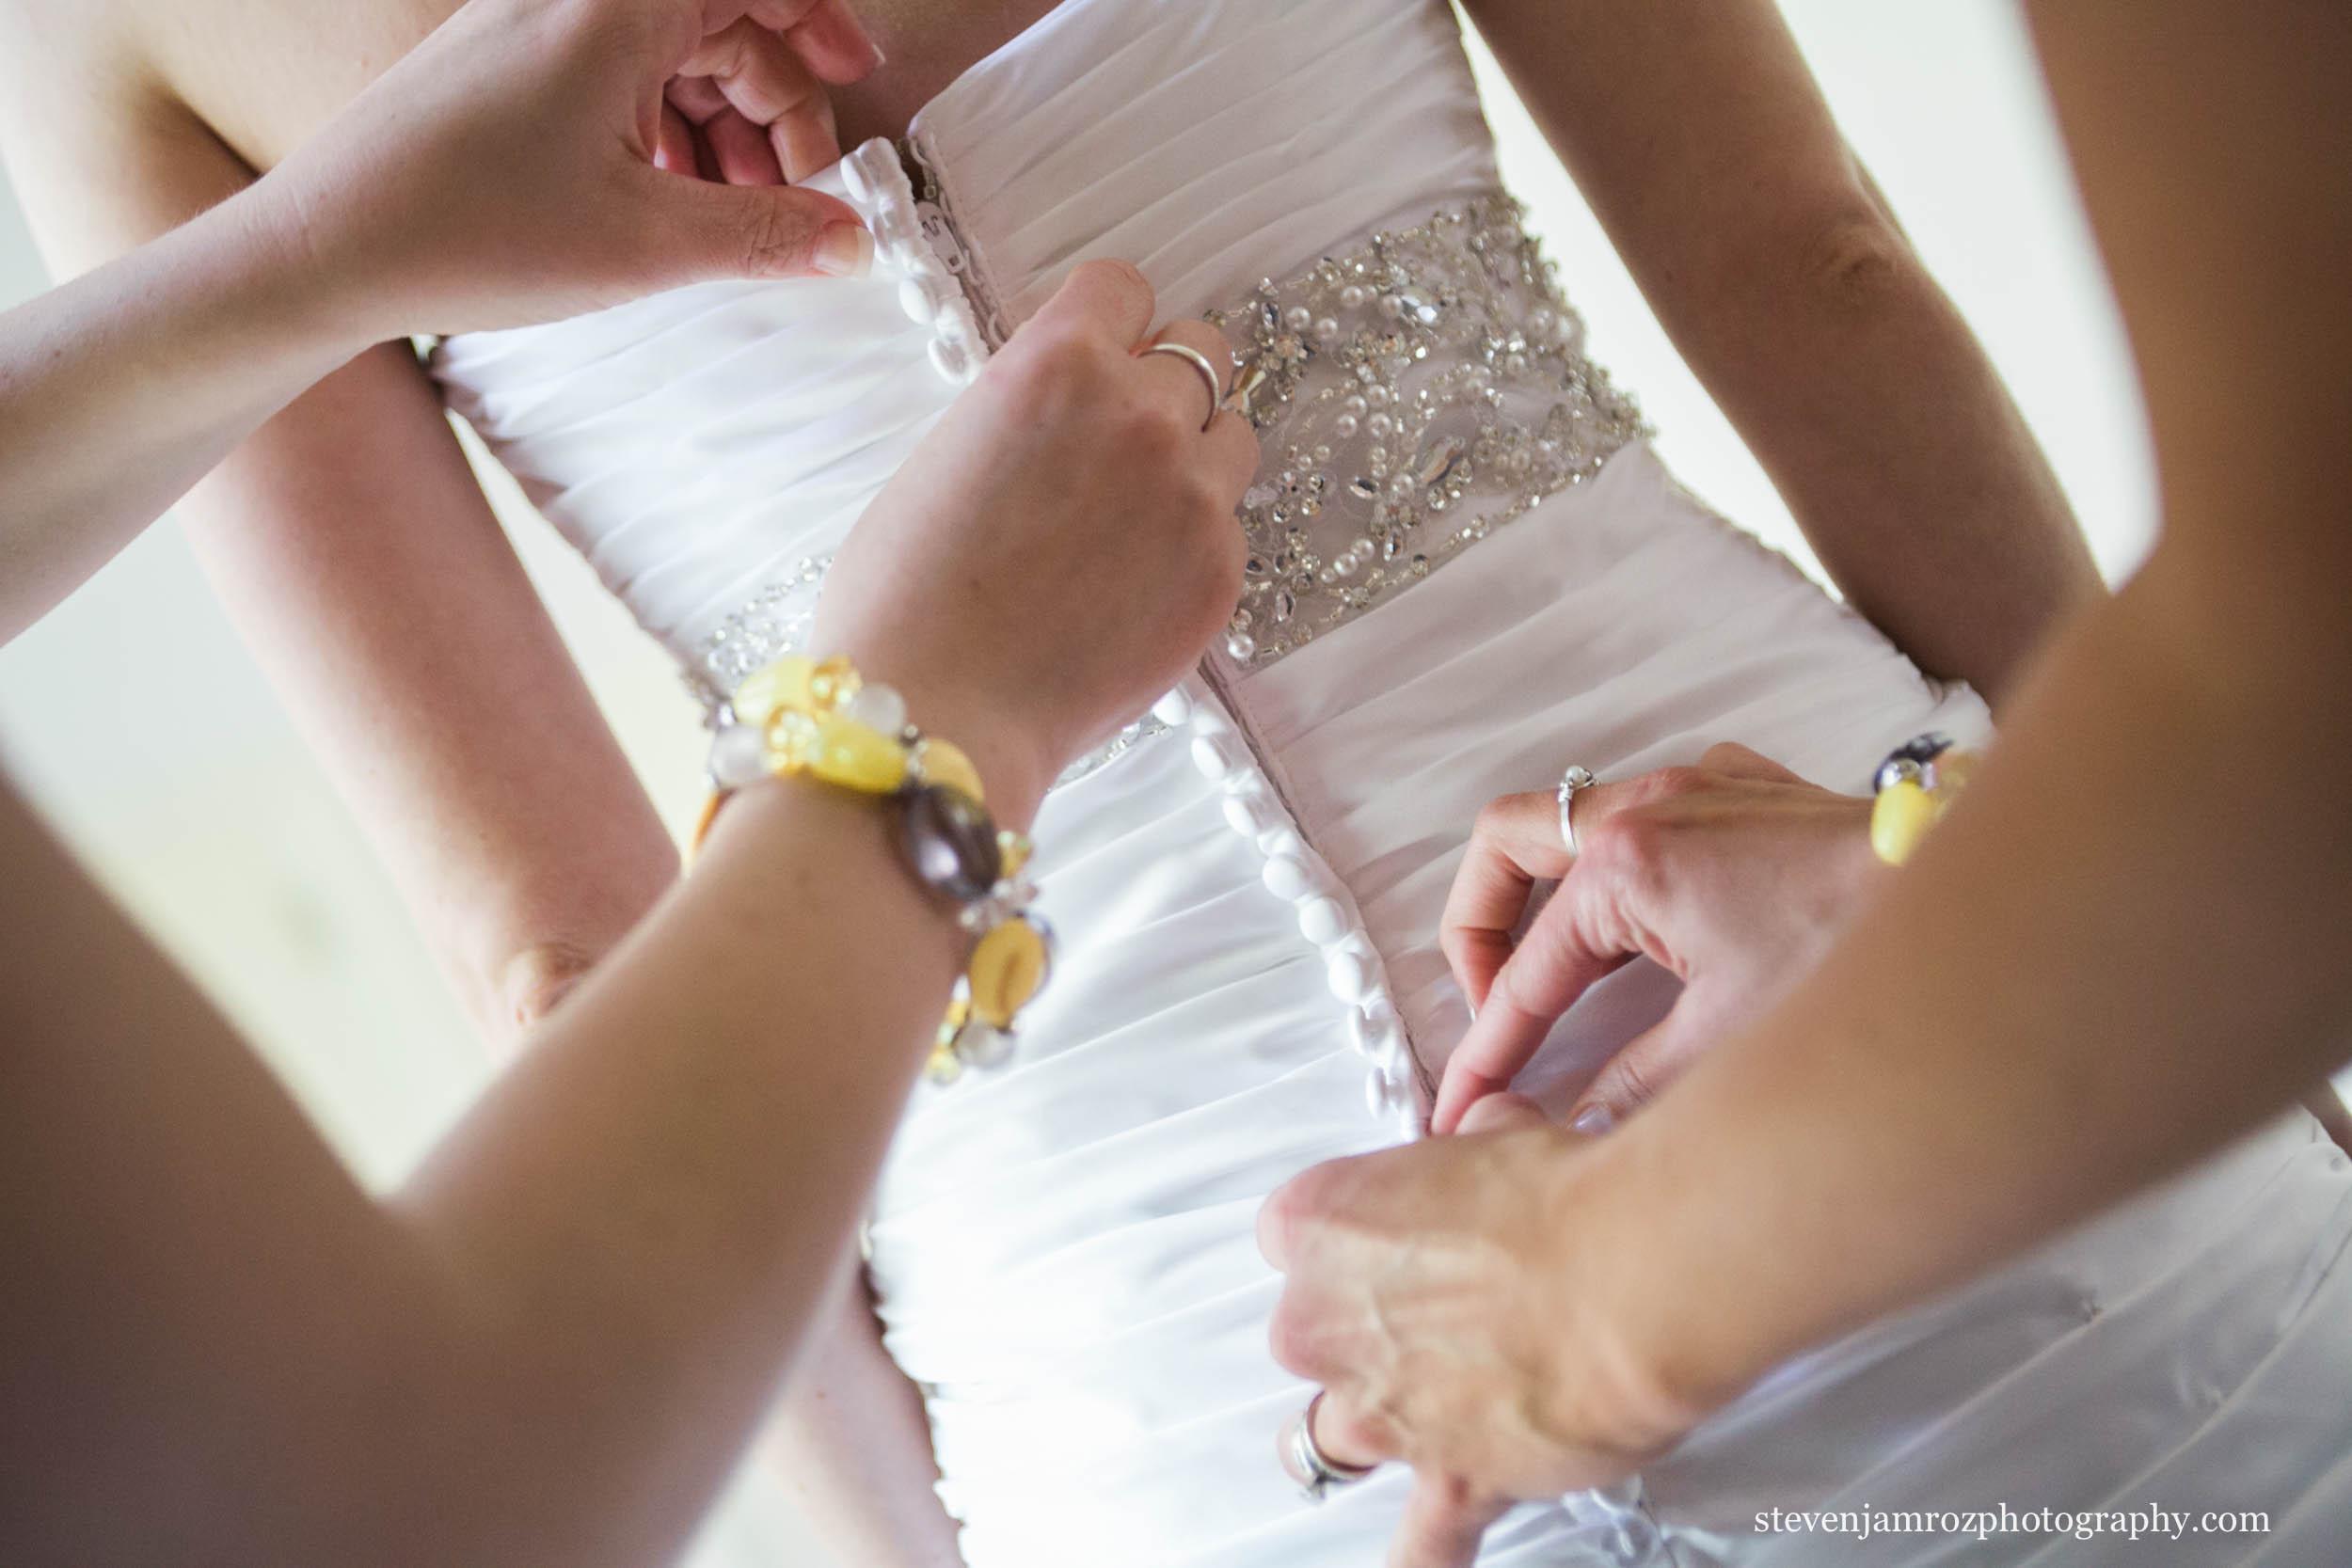 our-lady-of-lourdes-wedding photographer-steven-jamroz-0652.jpg